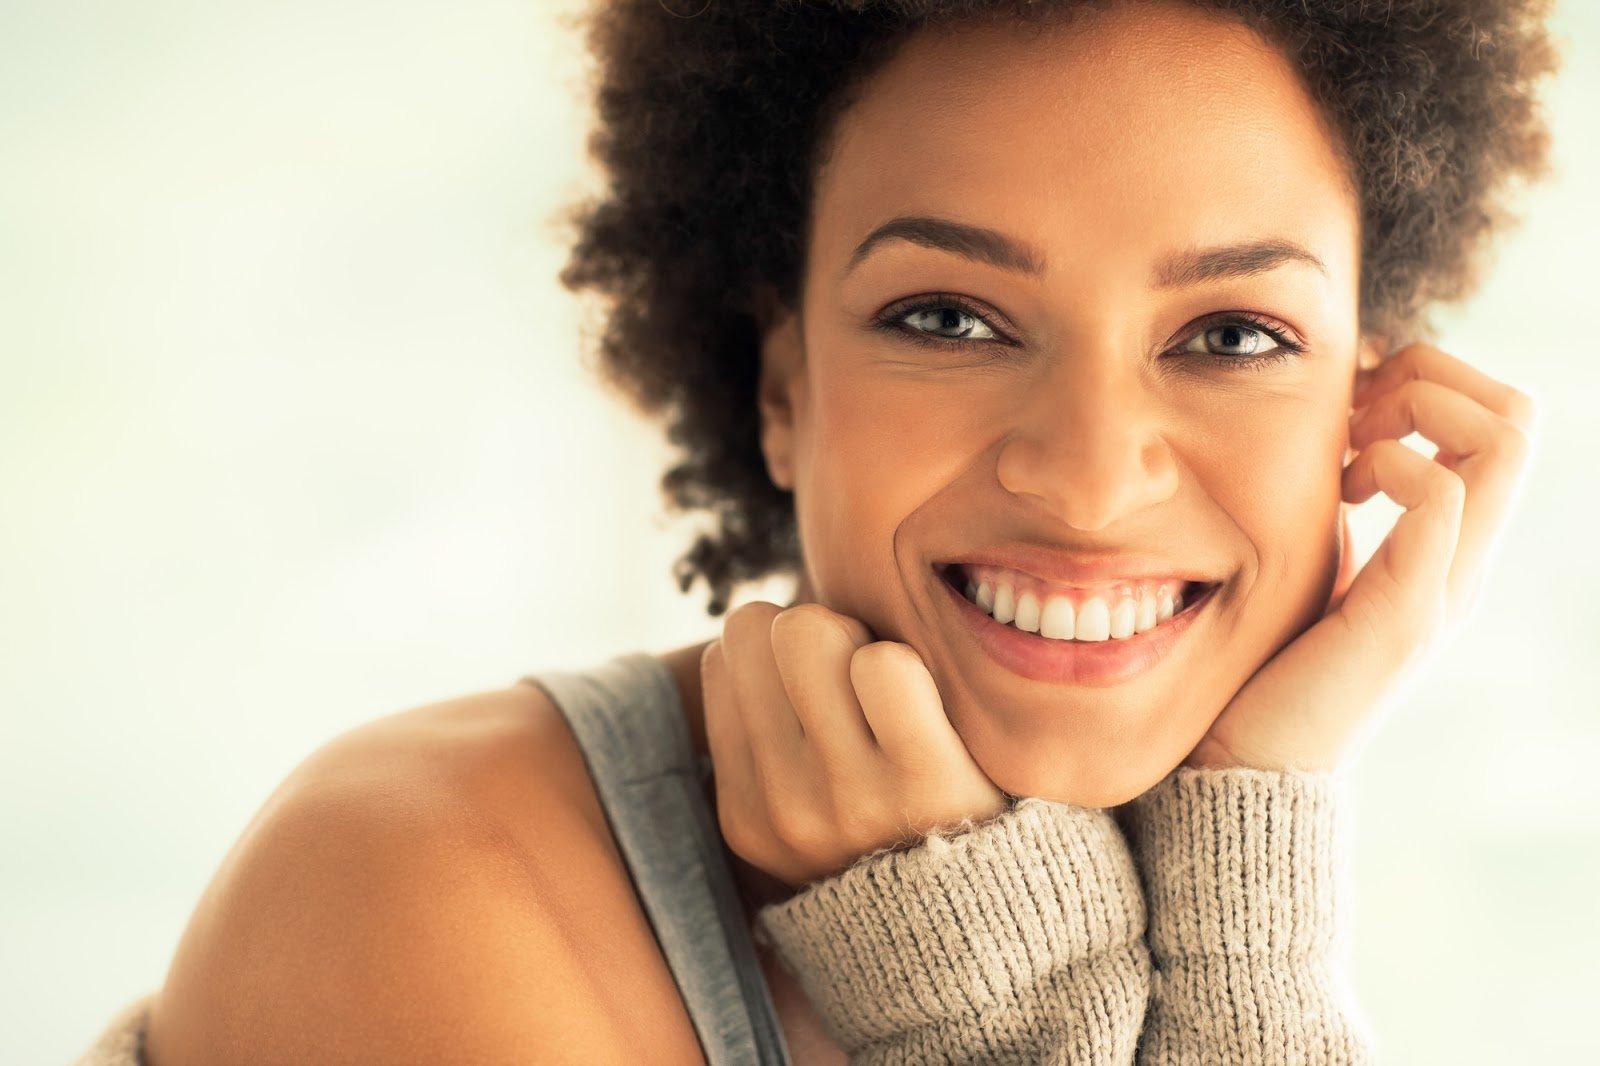 B-BEAUTY: THE NATURAL BLACK SKIN CARE REVOLUTION